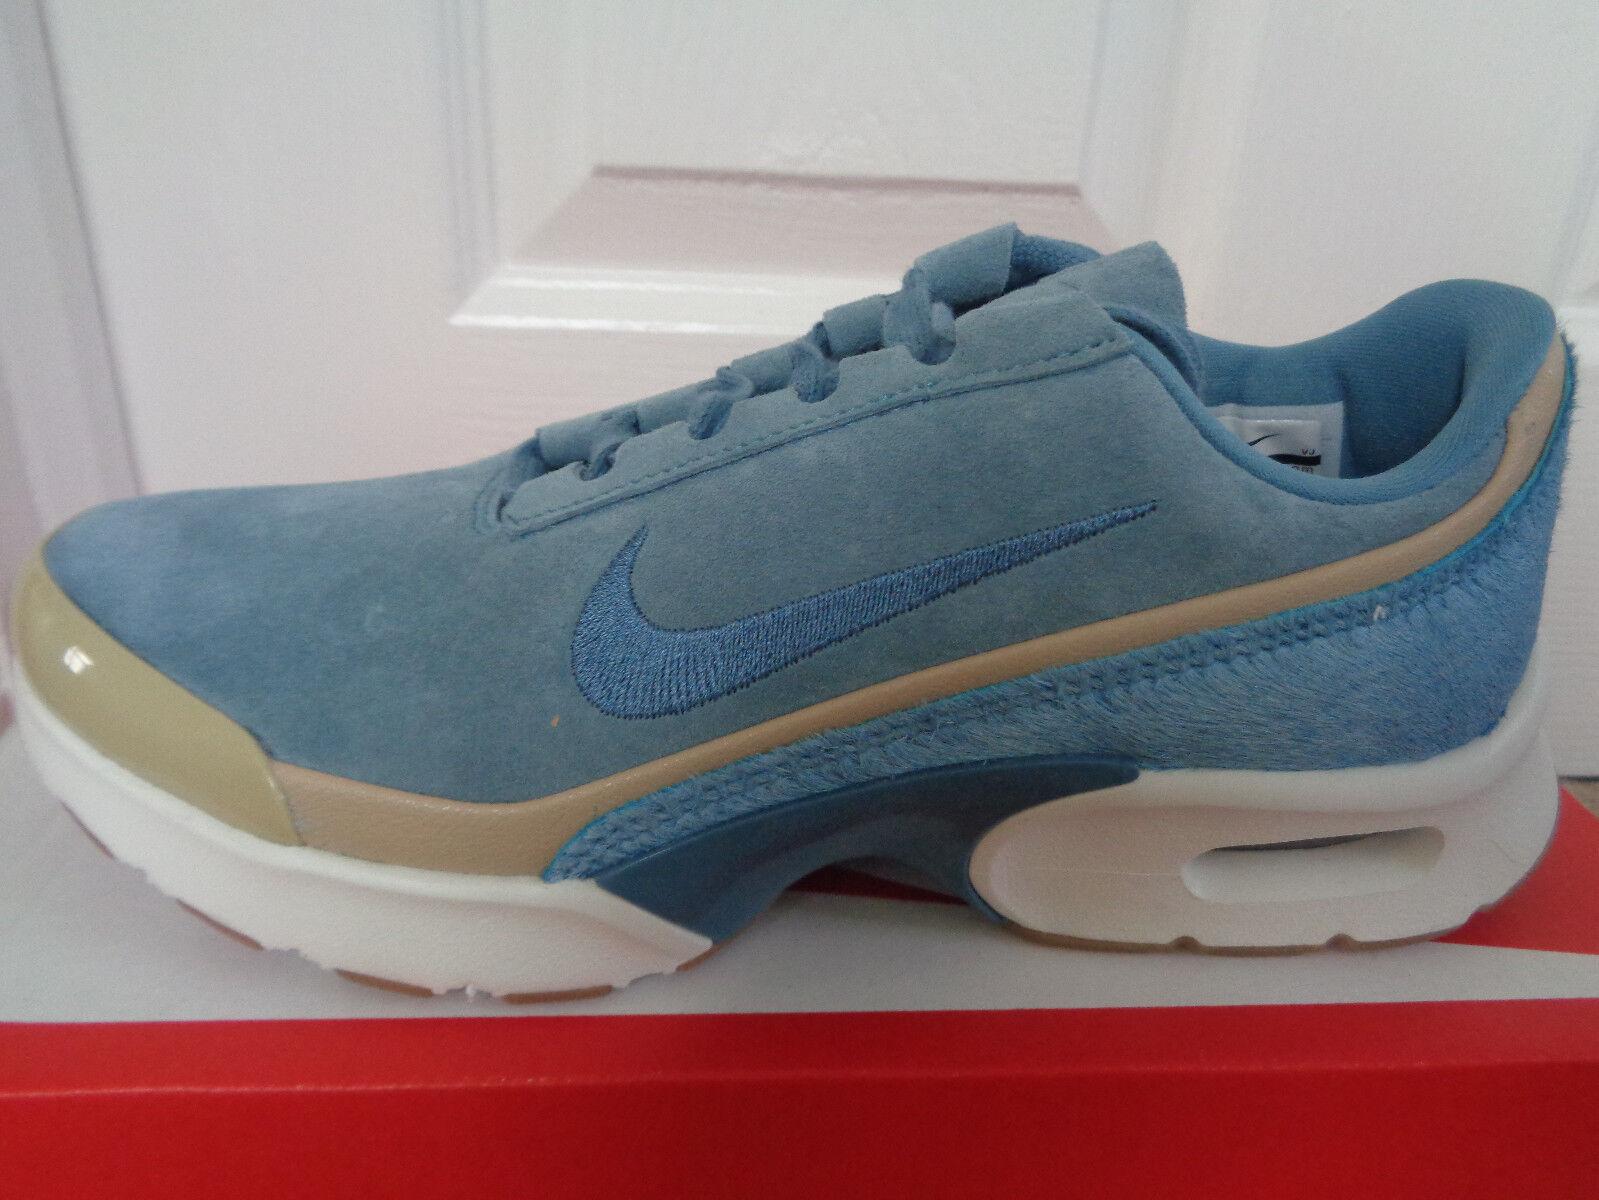 Nike Air Max Jewell LX trainers schuhe 896196 002 uk 4 eu 37.5 us 6.5 NEW+BOX